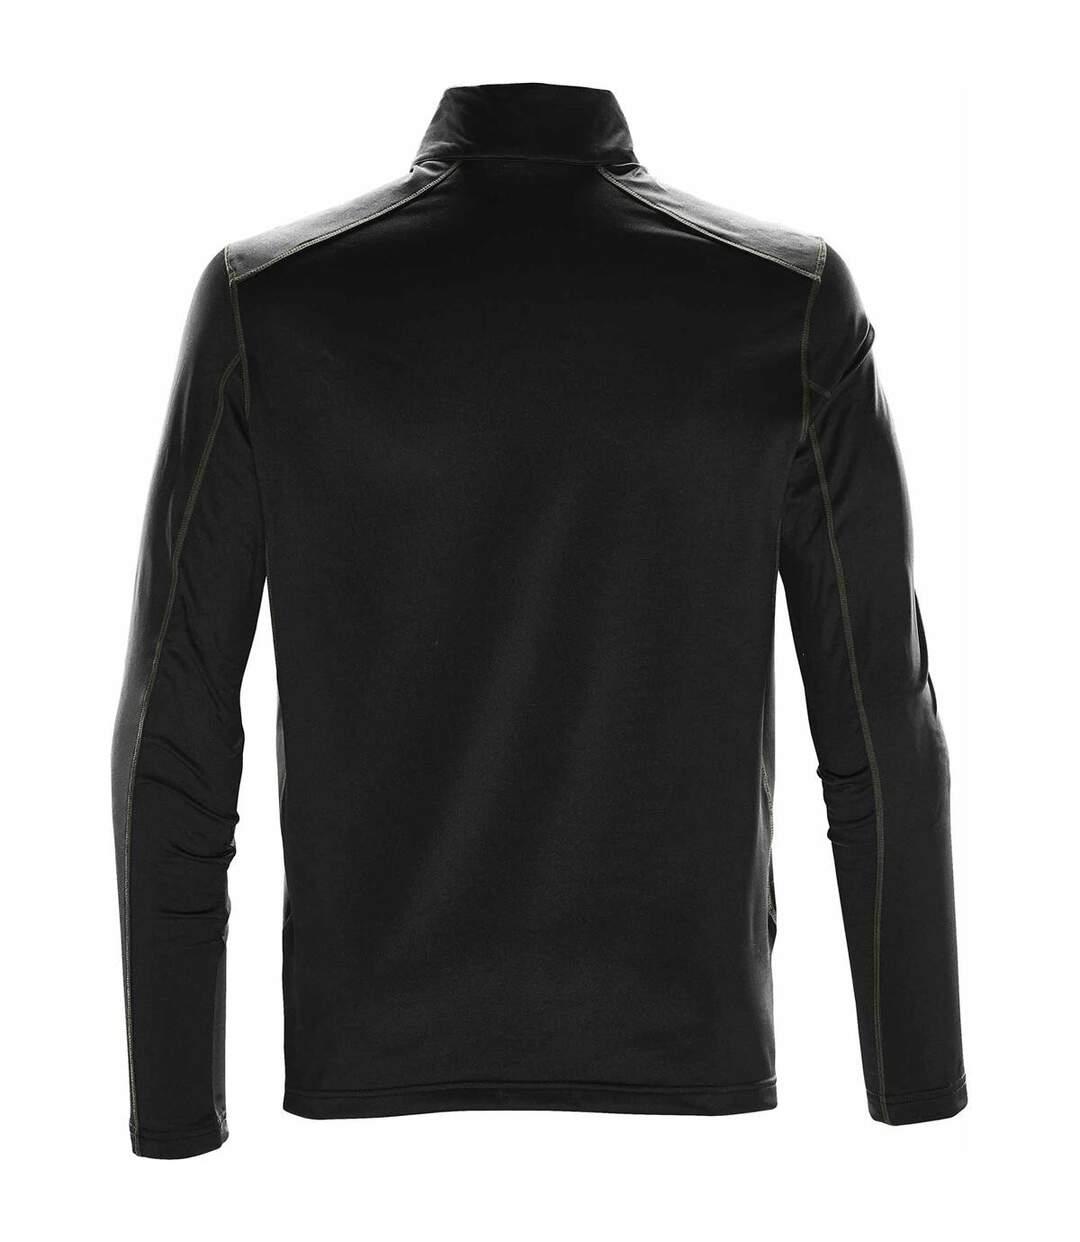 Stormtech Mens Pulse Fleece Pullover (Black/Carbon) - UTBC4121